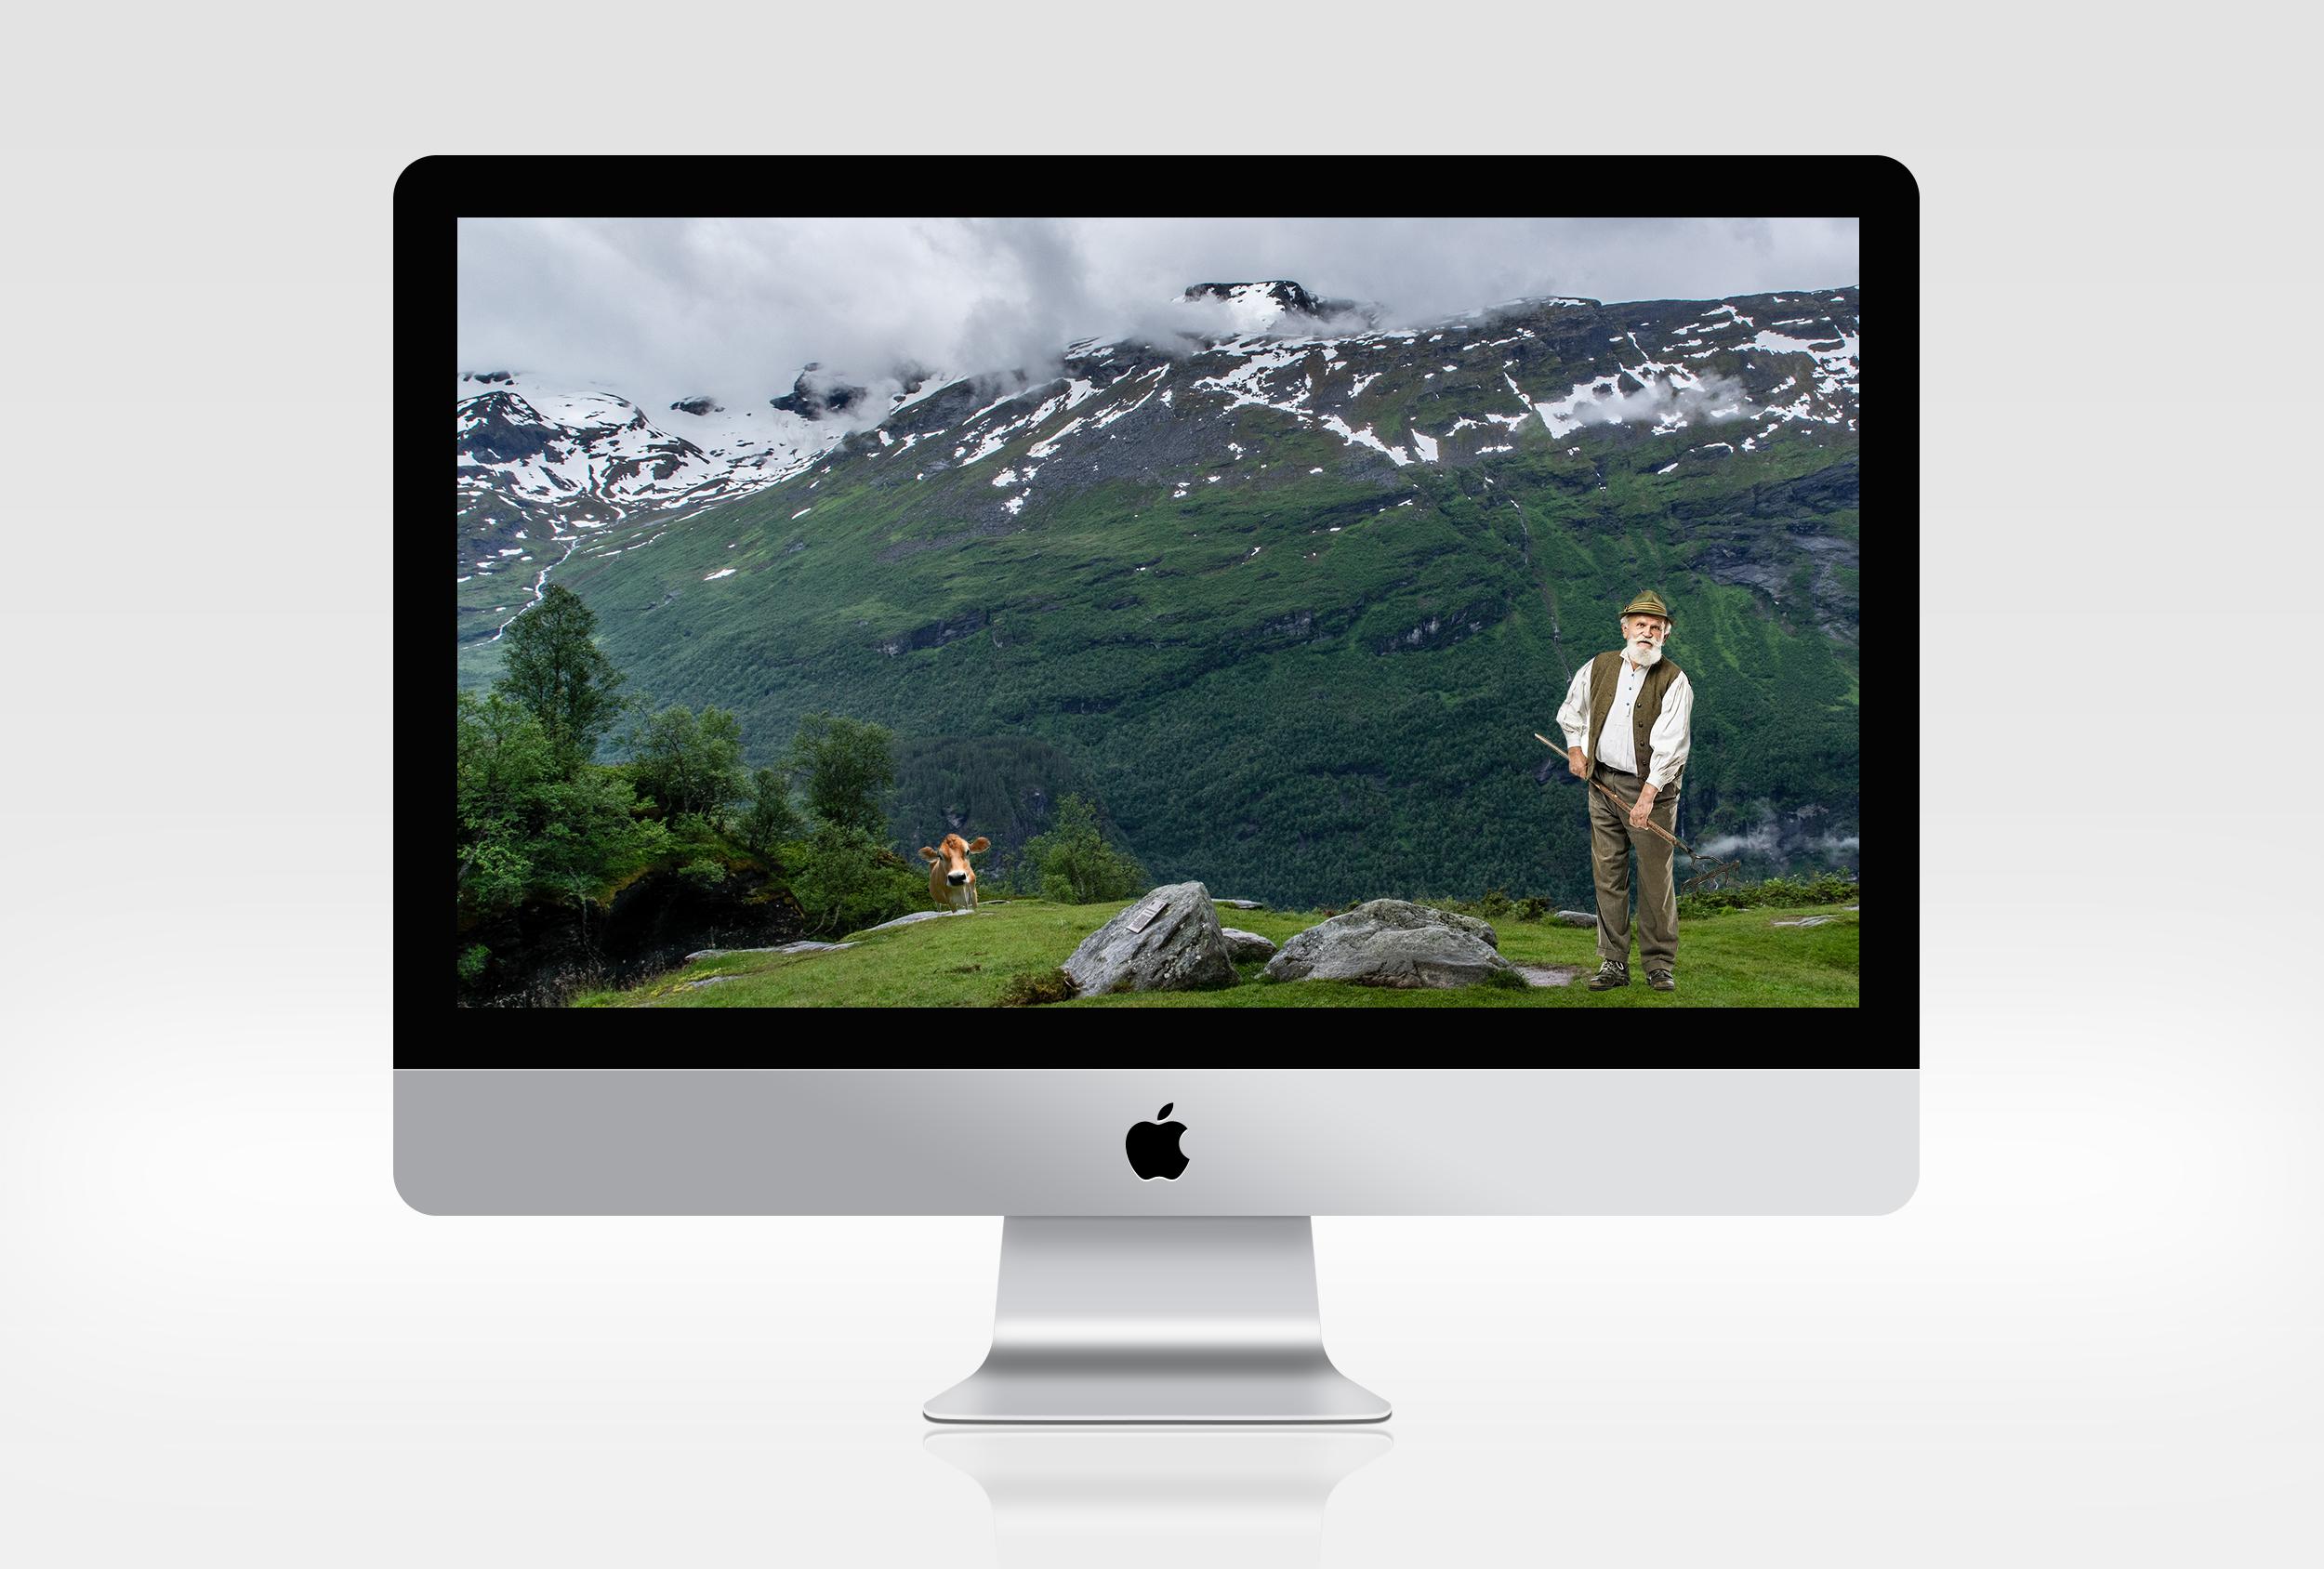 iMac-psd-mockup-template-5.png